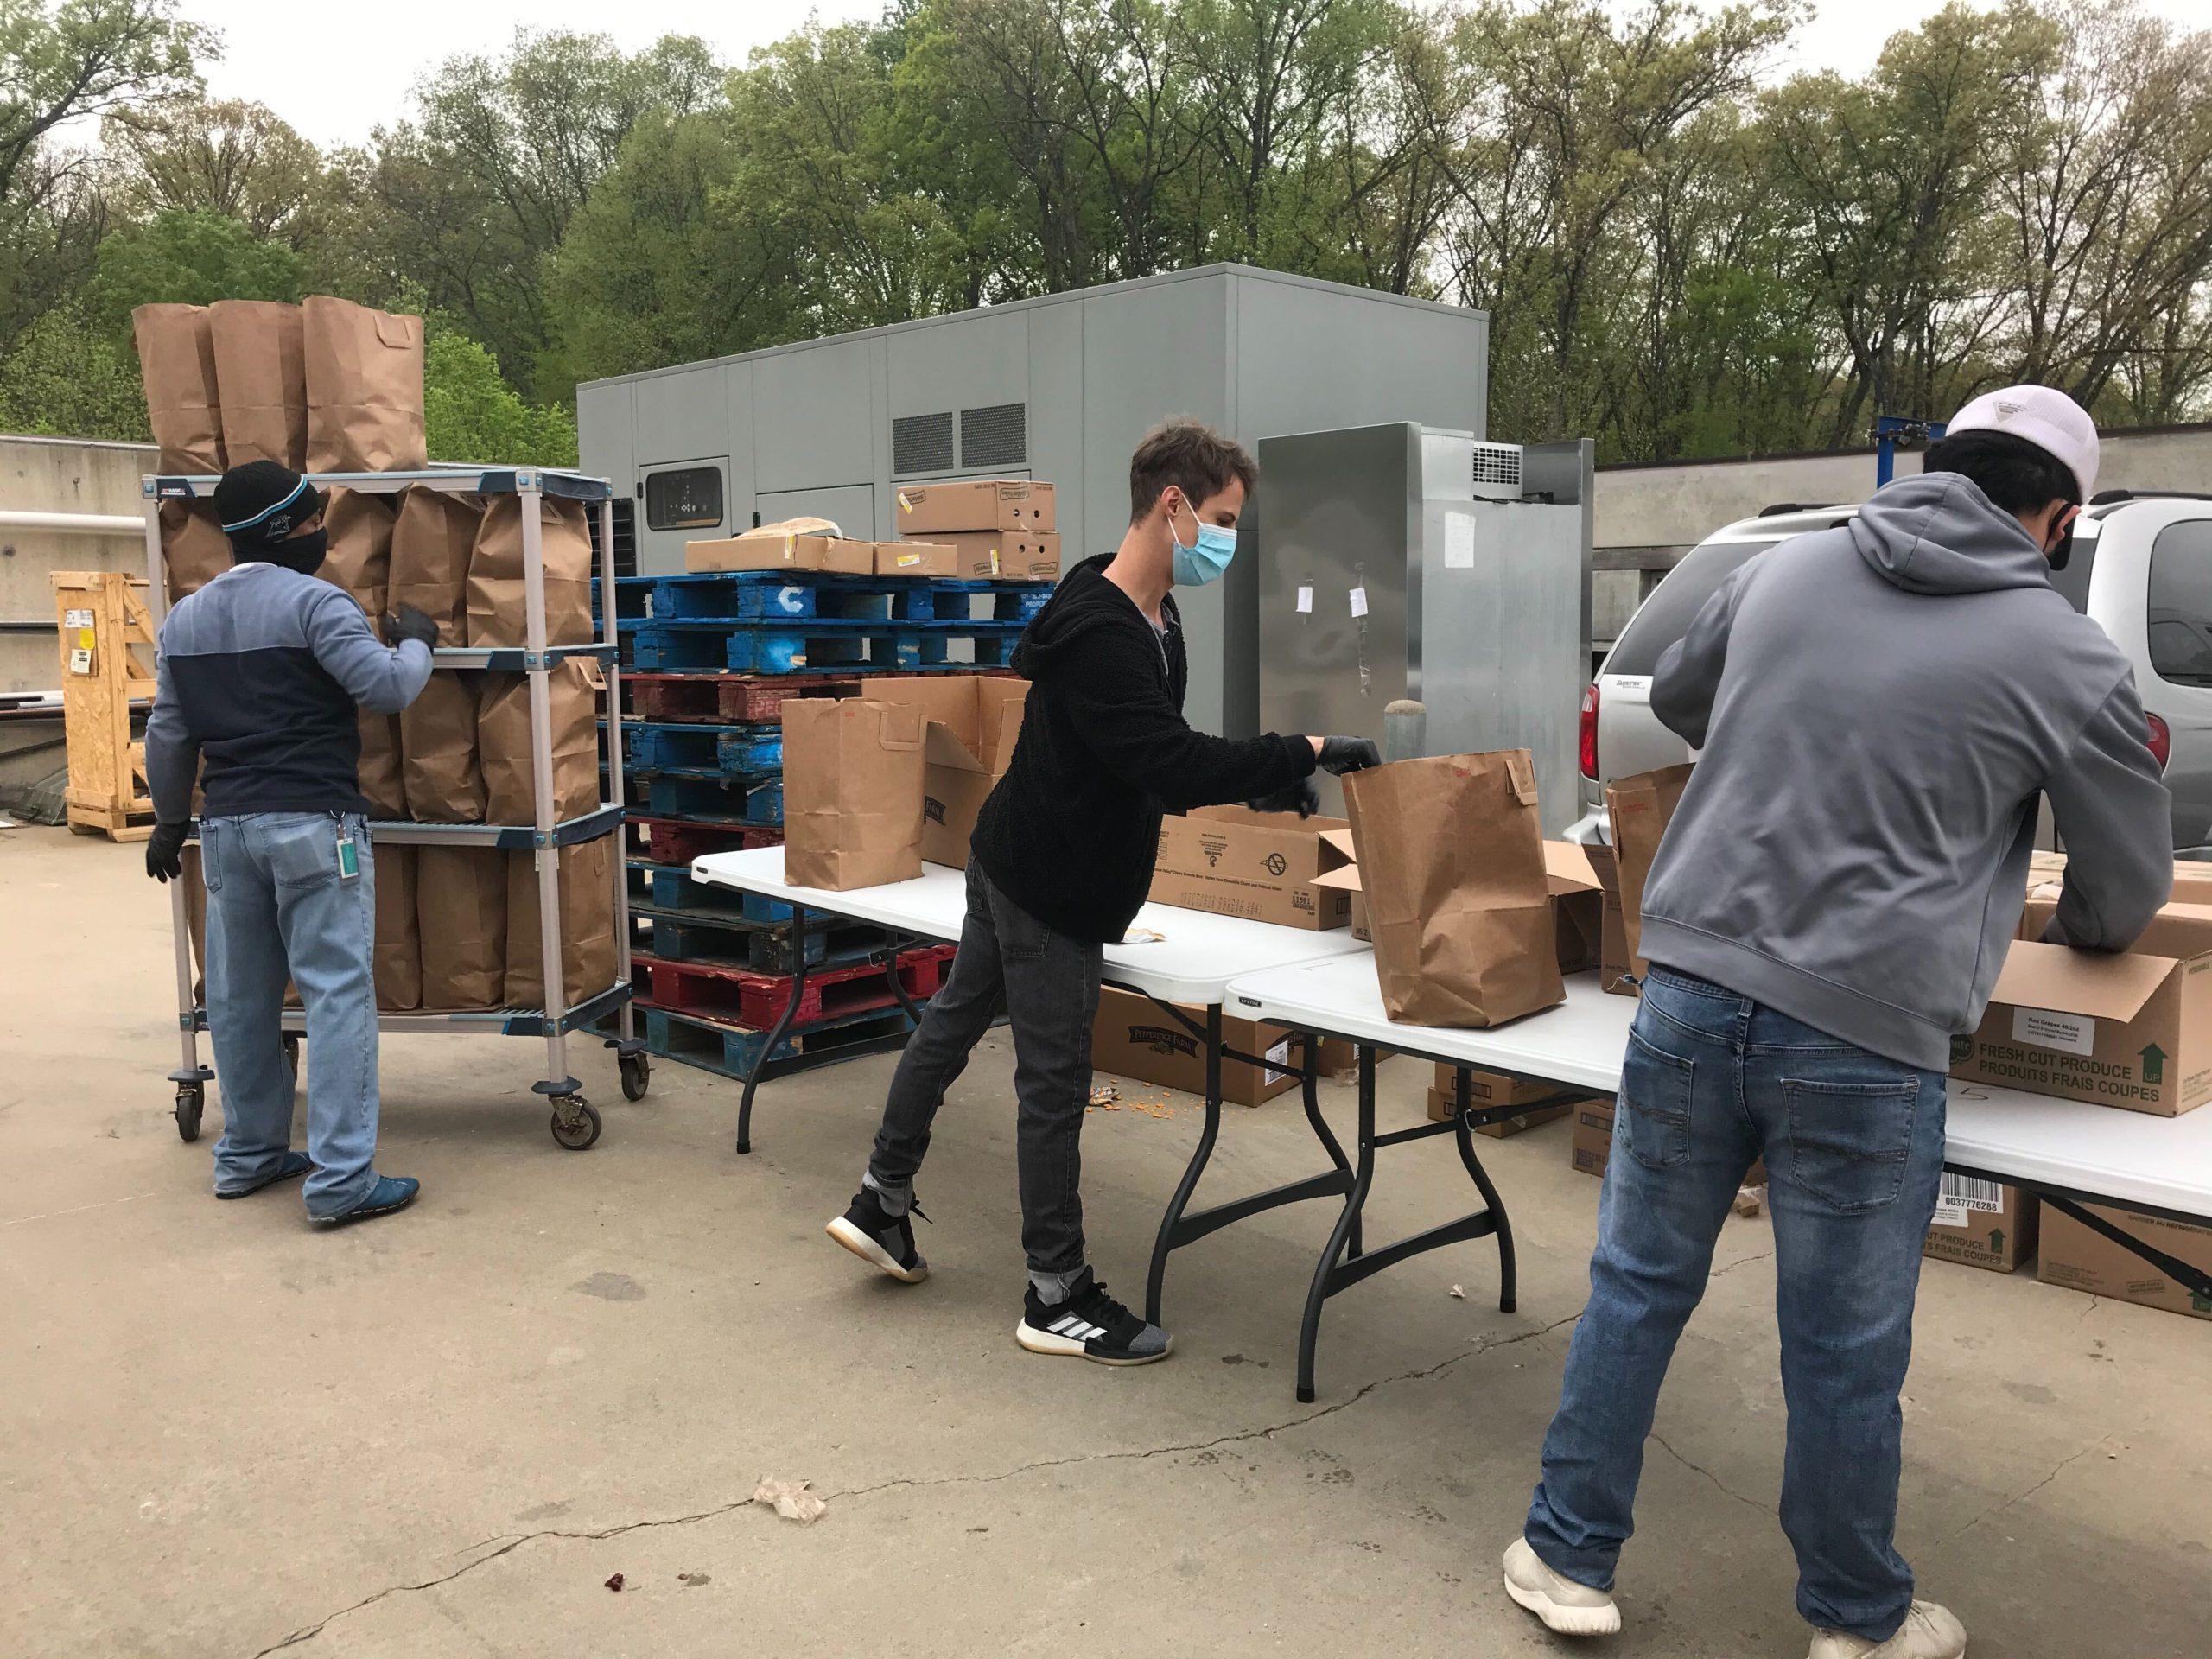 Staff members pack meals for school children at Crystal Bridges.